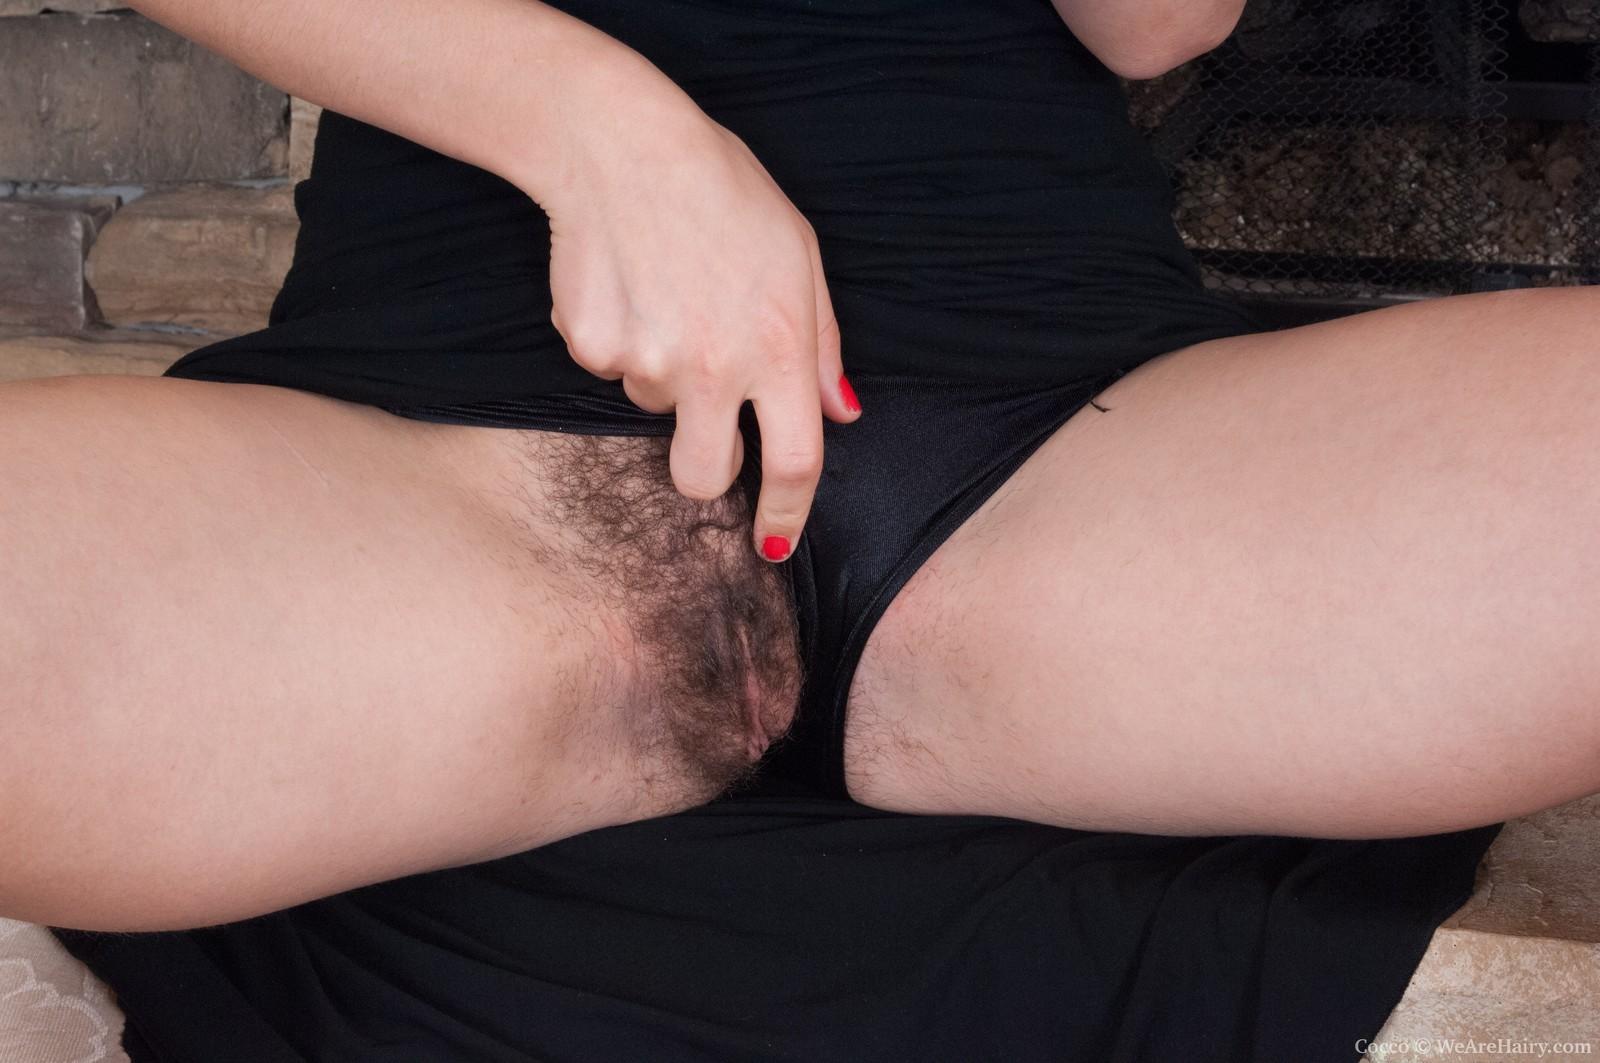 Portu girls sex nude photos